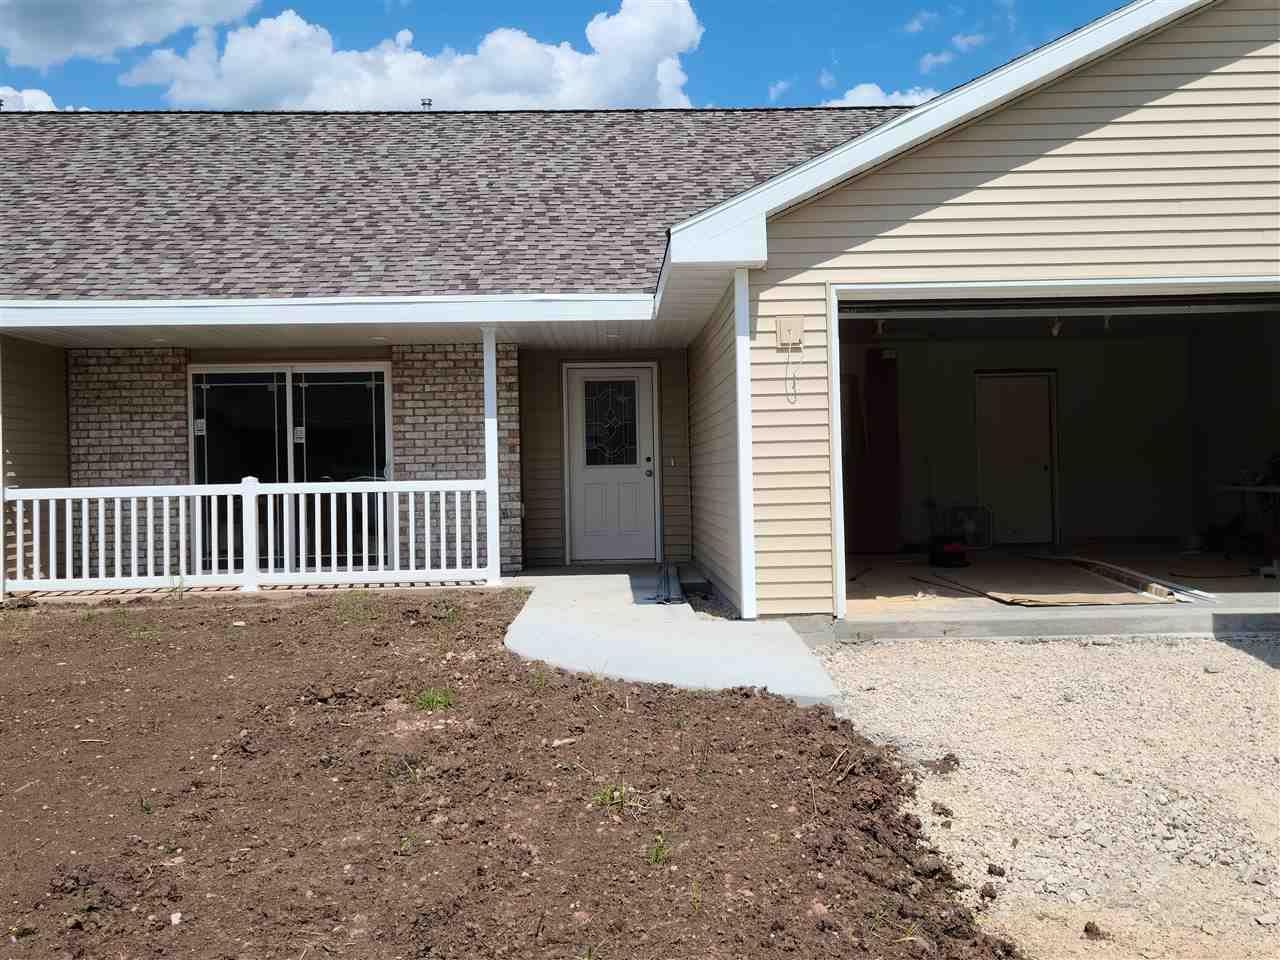 127 STONE CASTLE Drive, Fond du Lac, WI 54935 - MLS#: 50235179